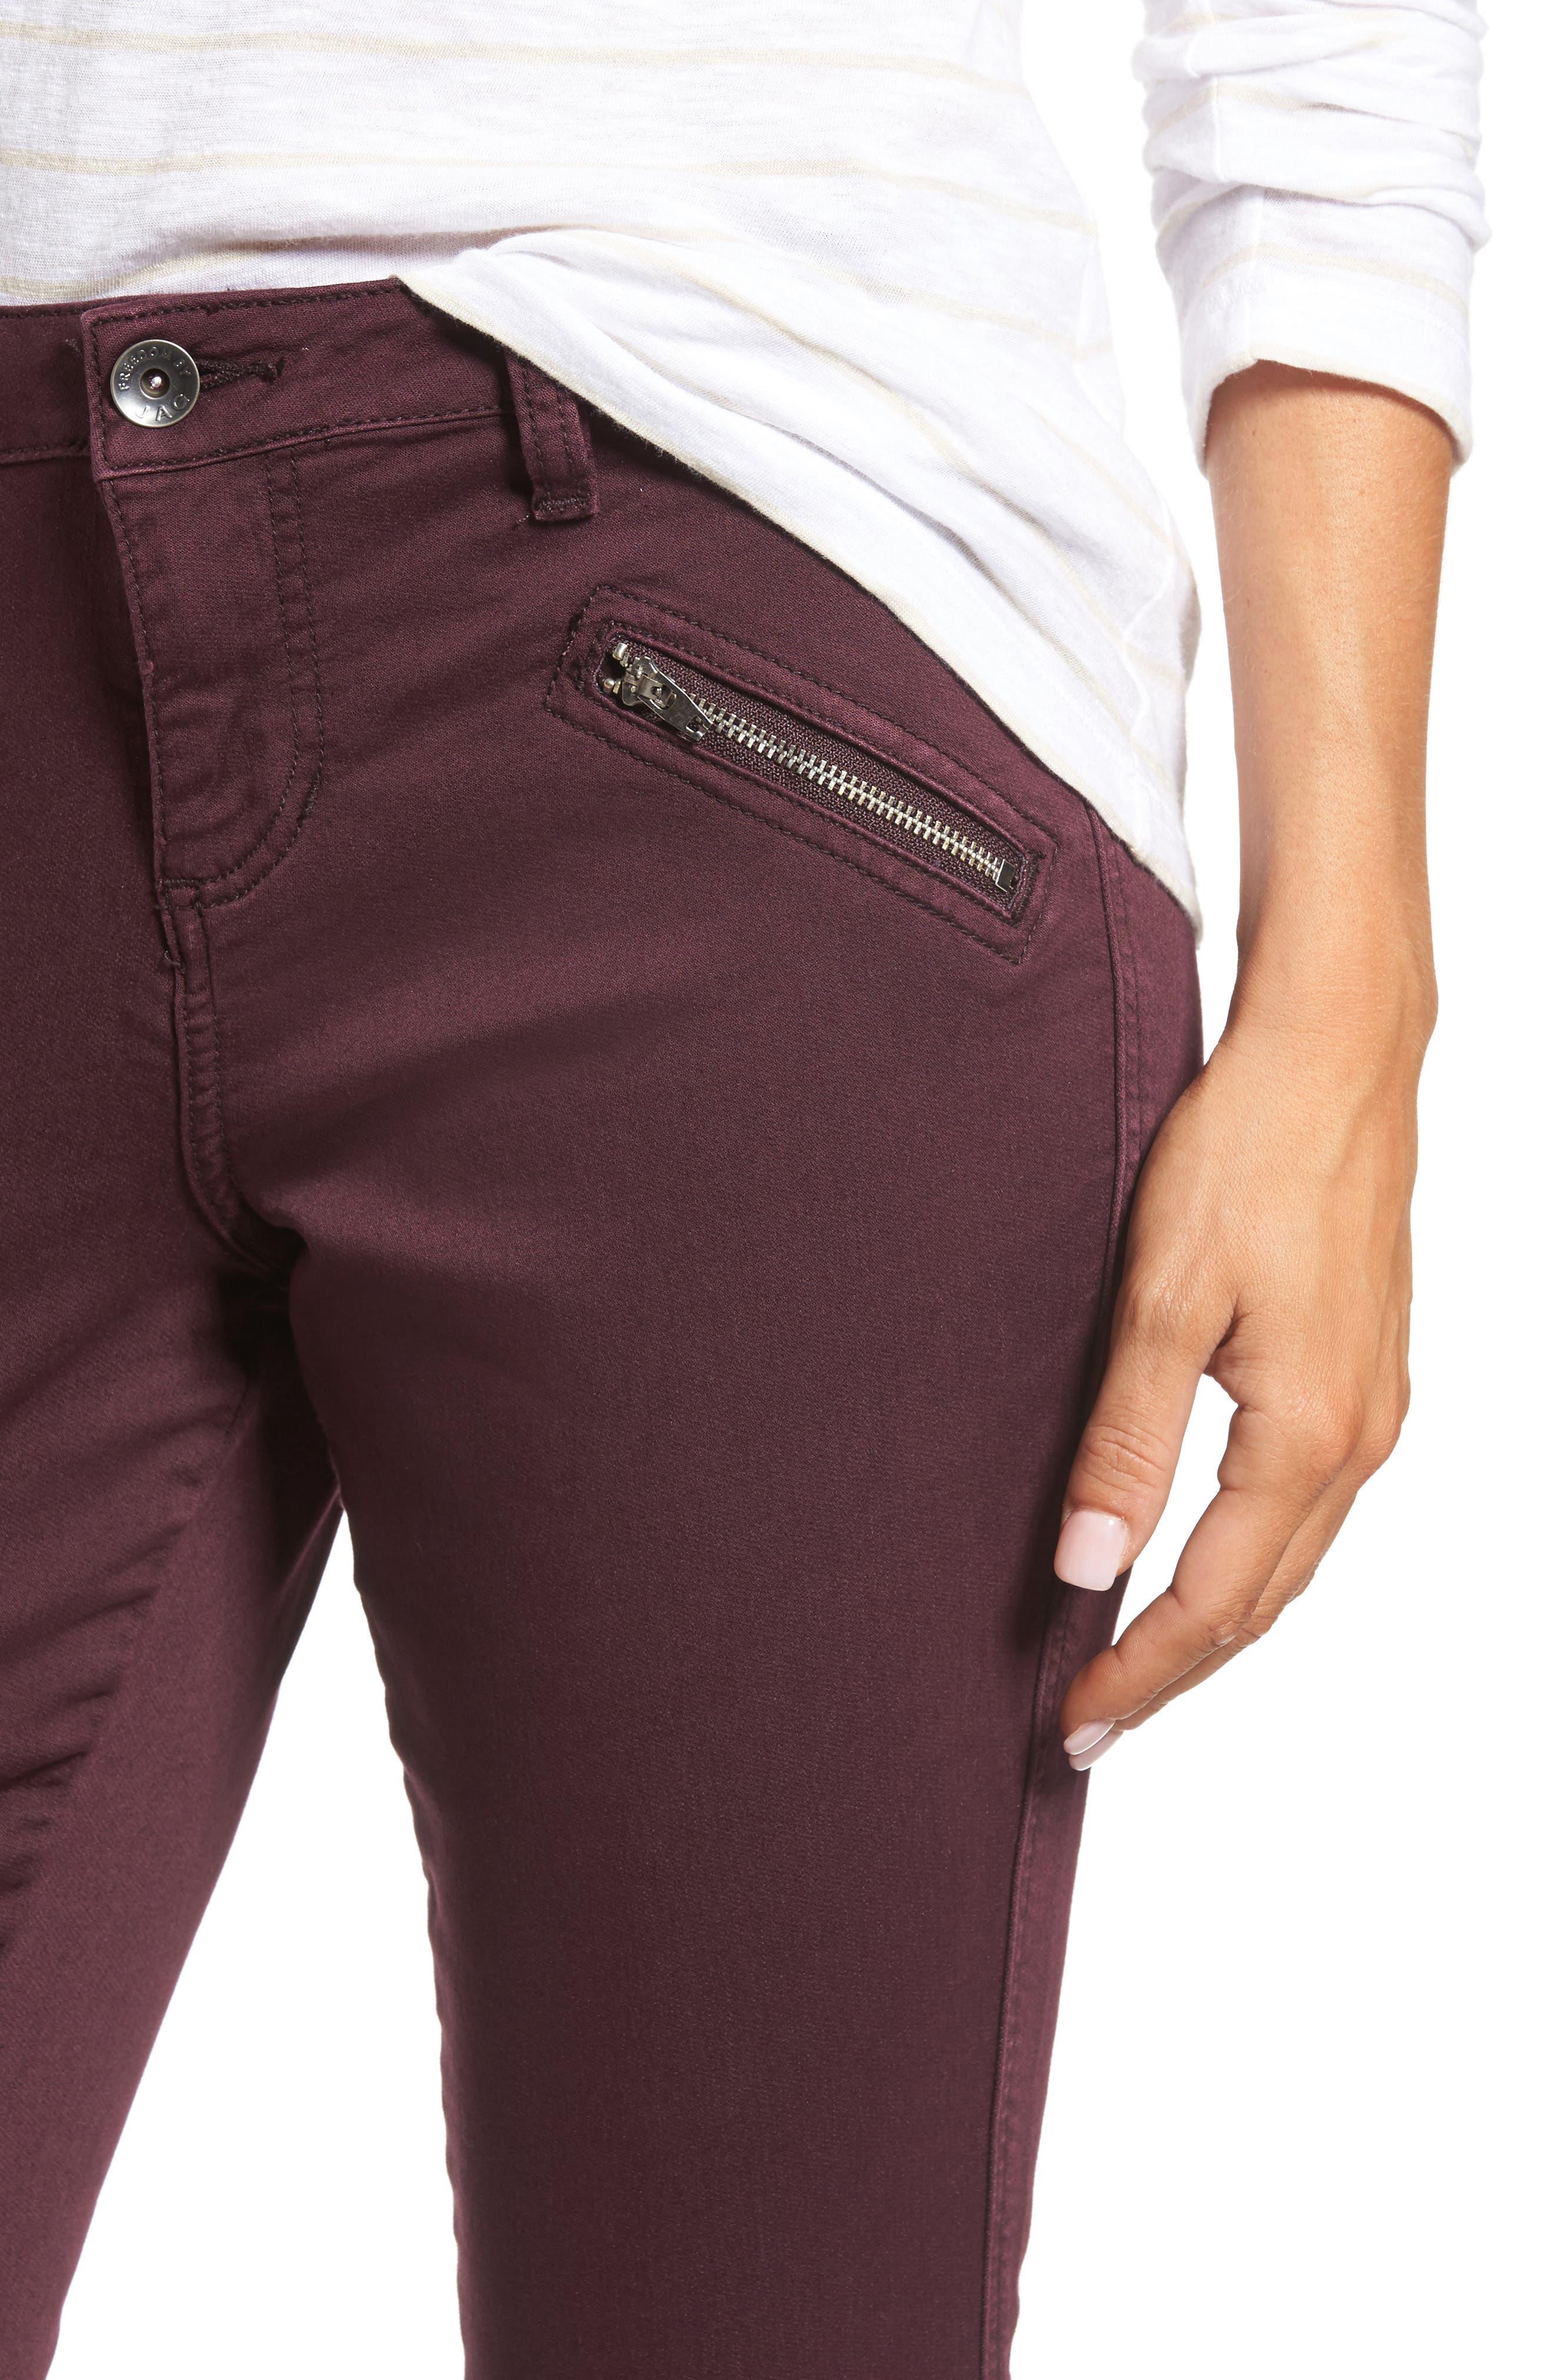 Ryan Knit Skinny Jeans,                             Alternate thumbnail 4, color,                             575